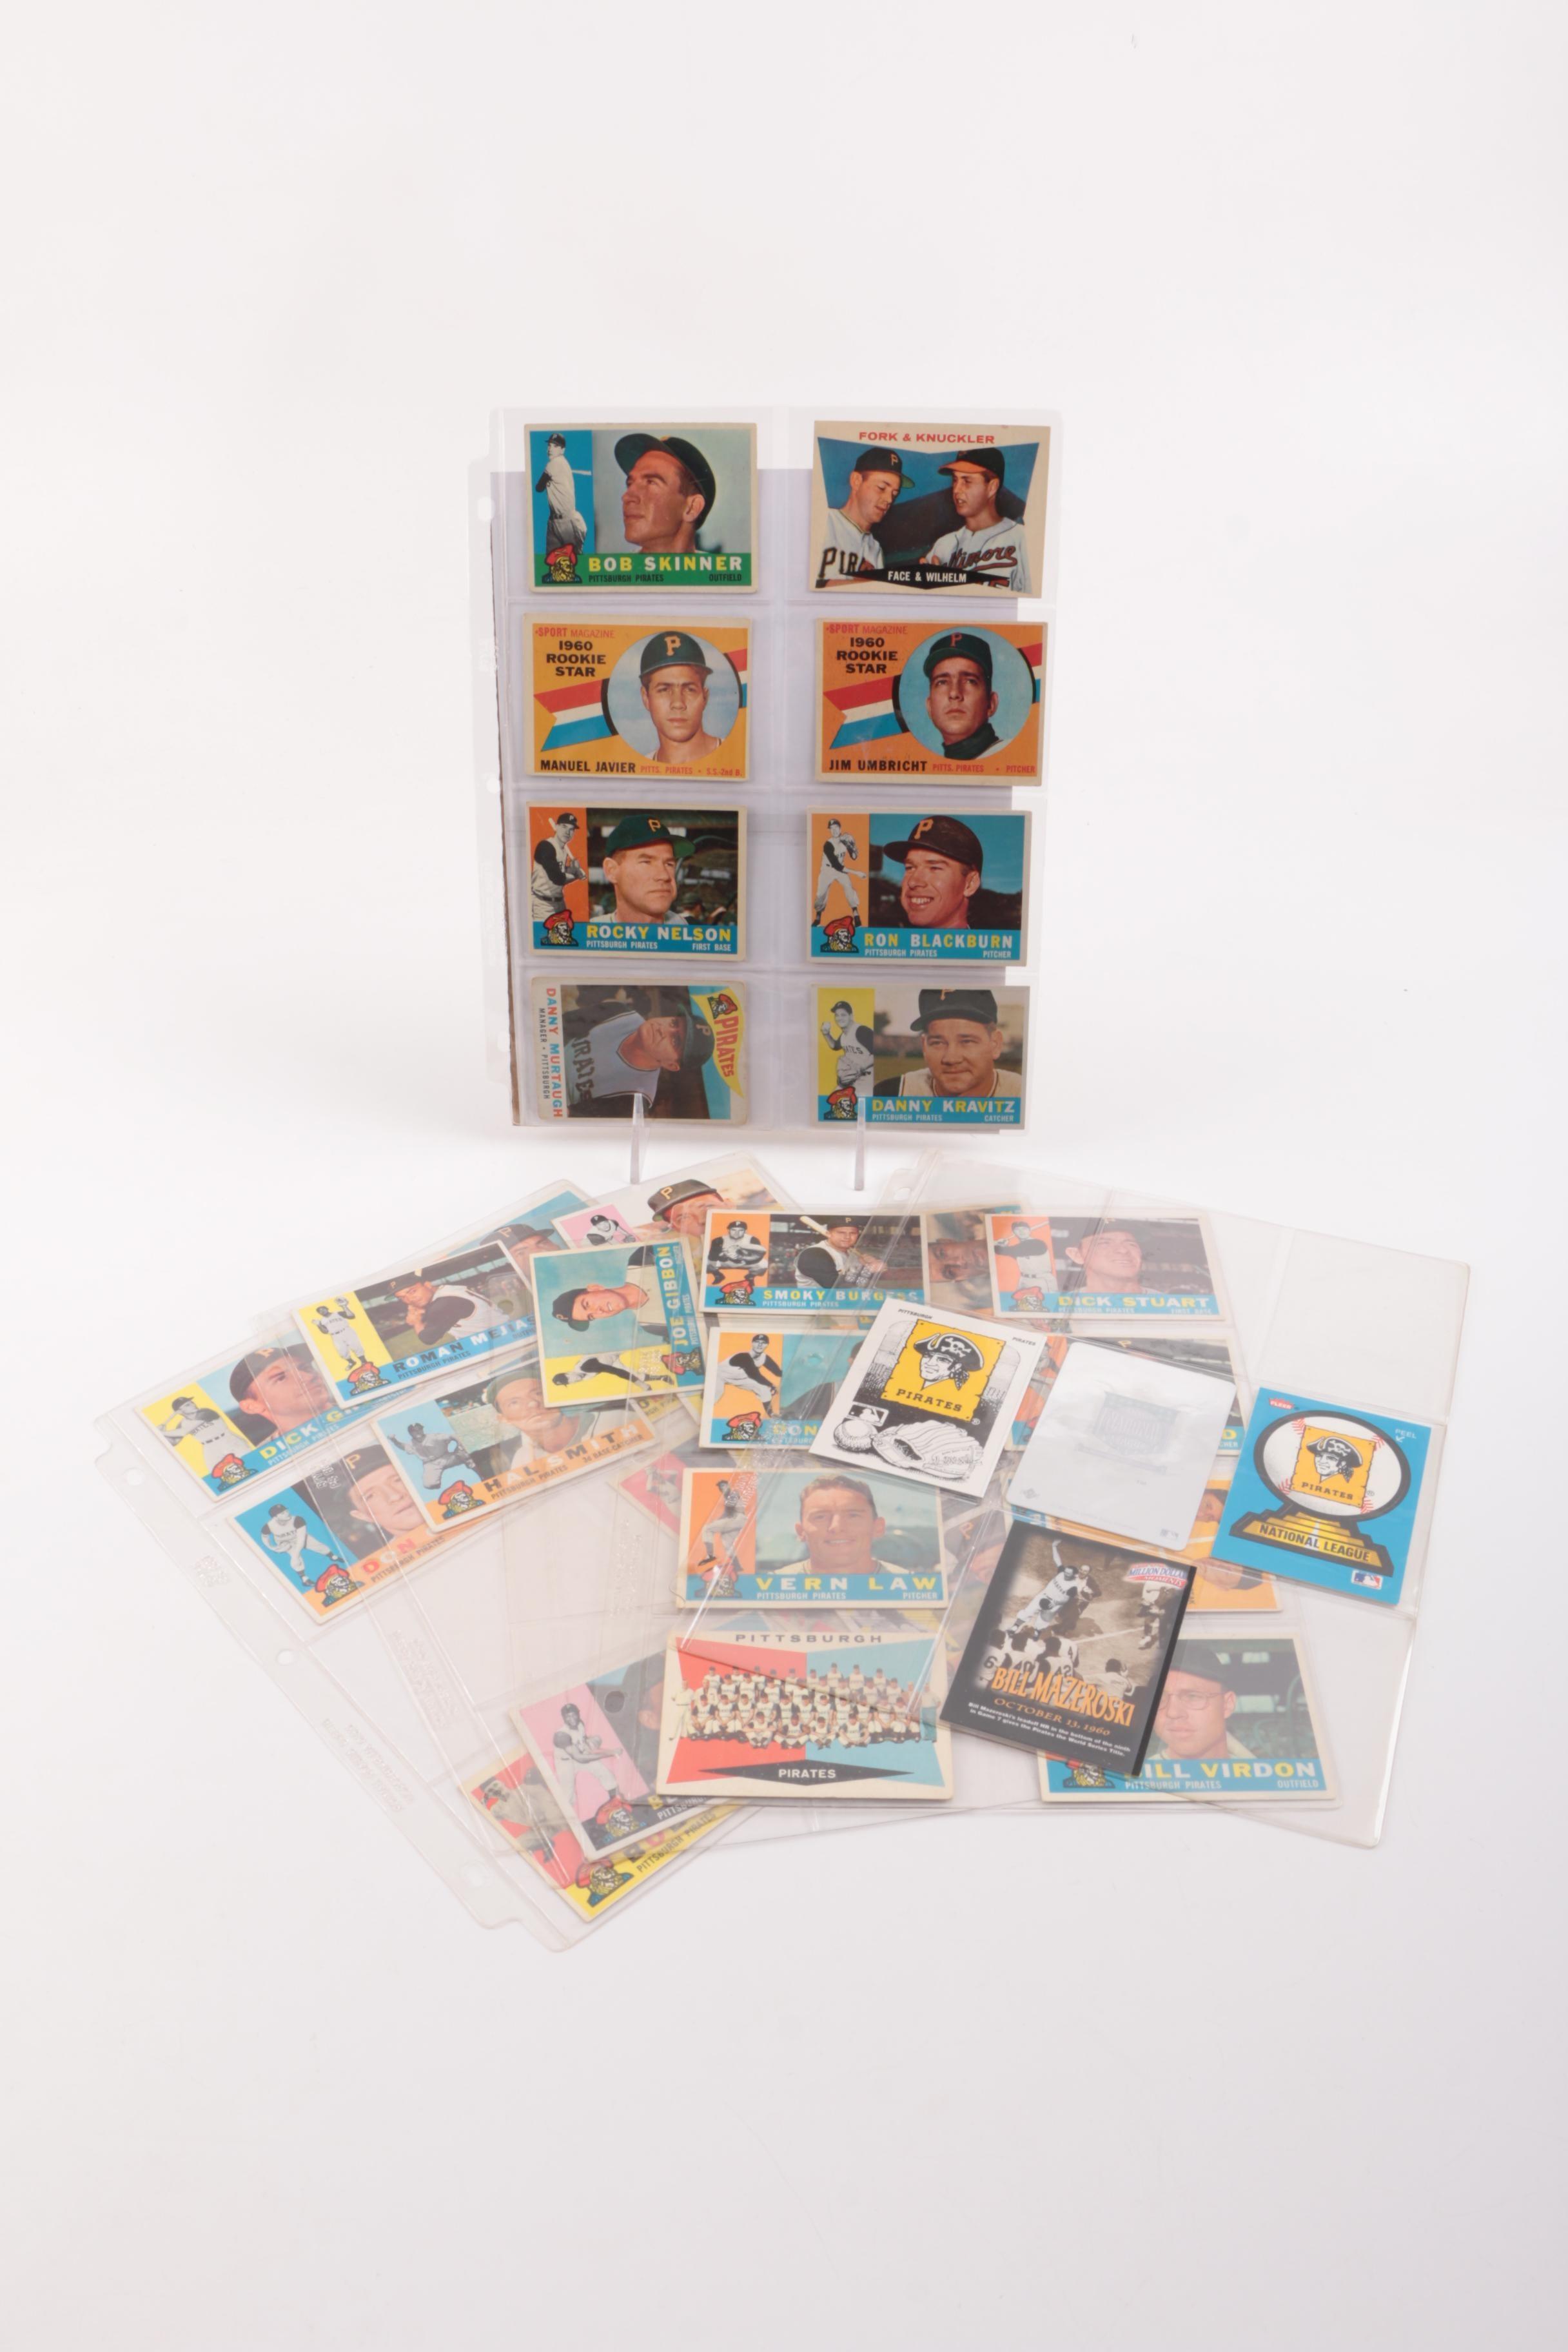 Baseball Card Collection Featuring Pittsburgh Pirates Circa 1960